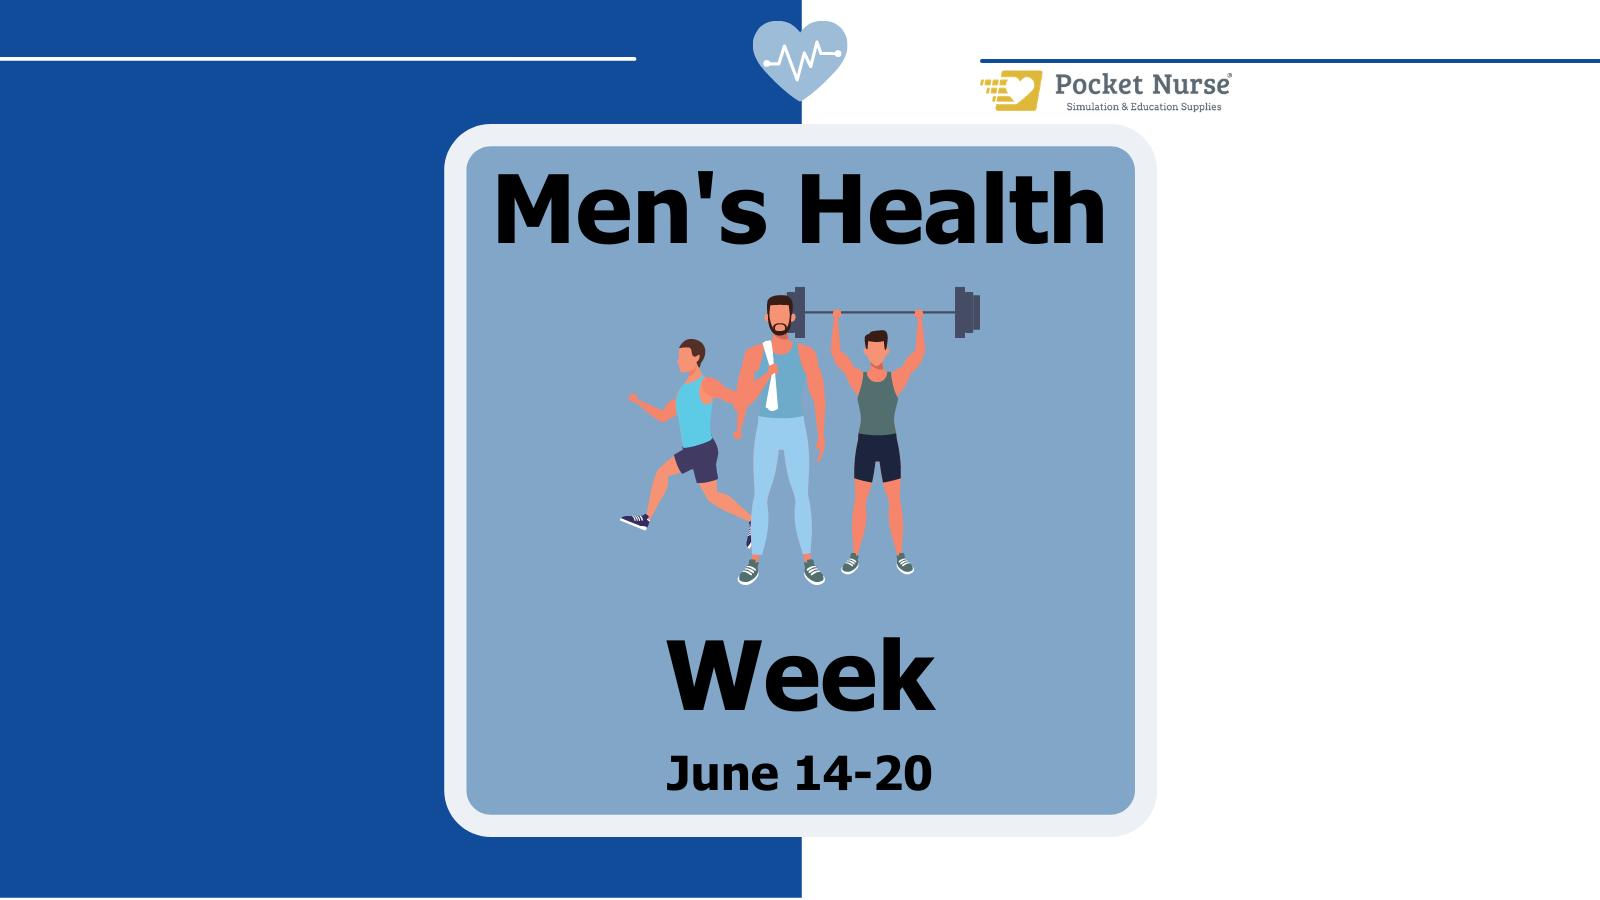 Pocket Nurse recognizes Men's Health Week